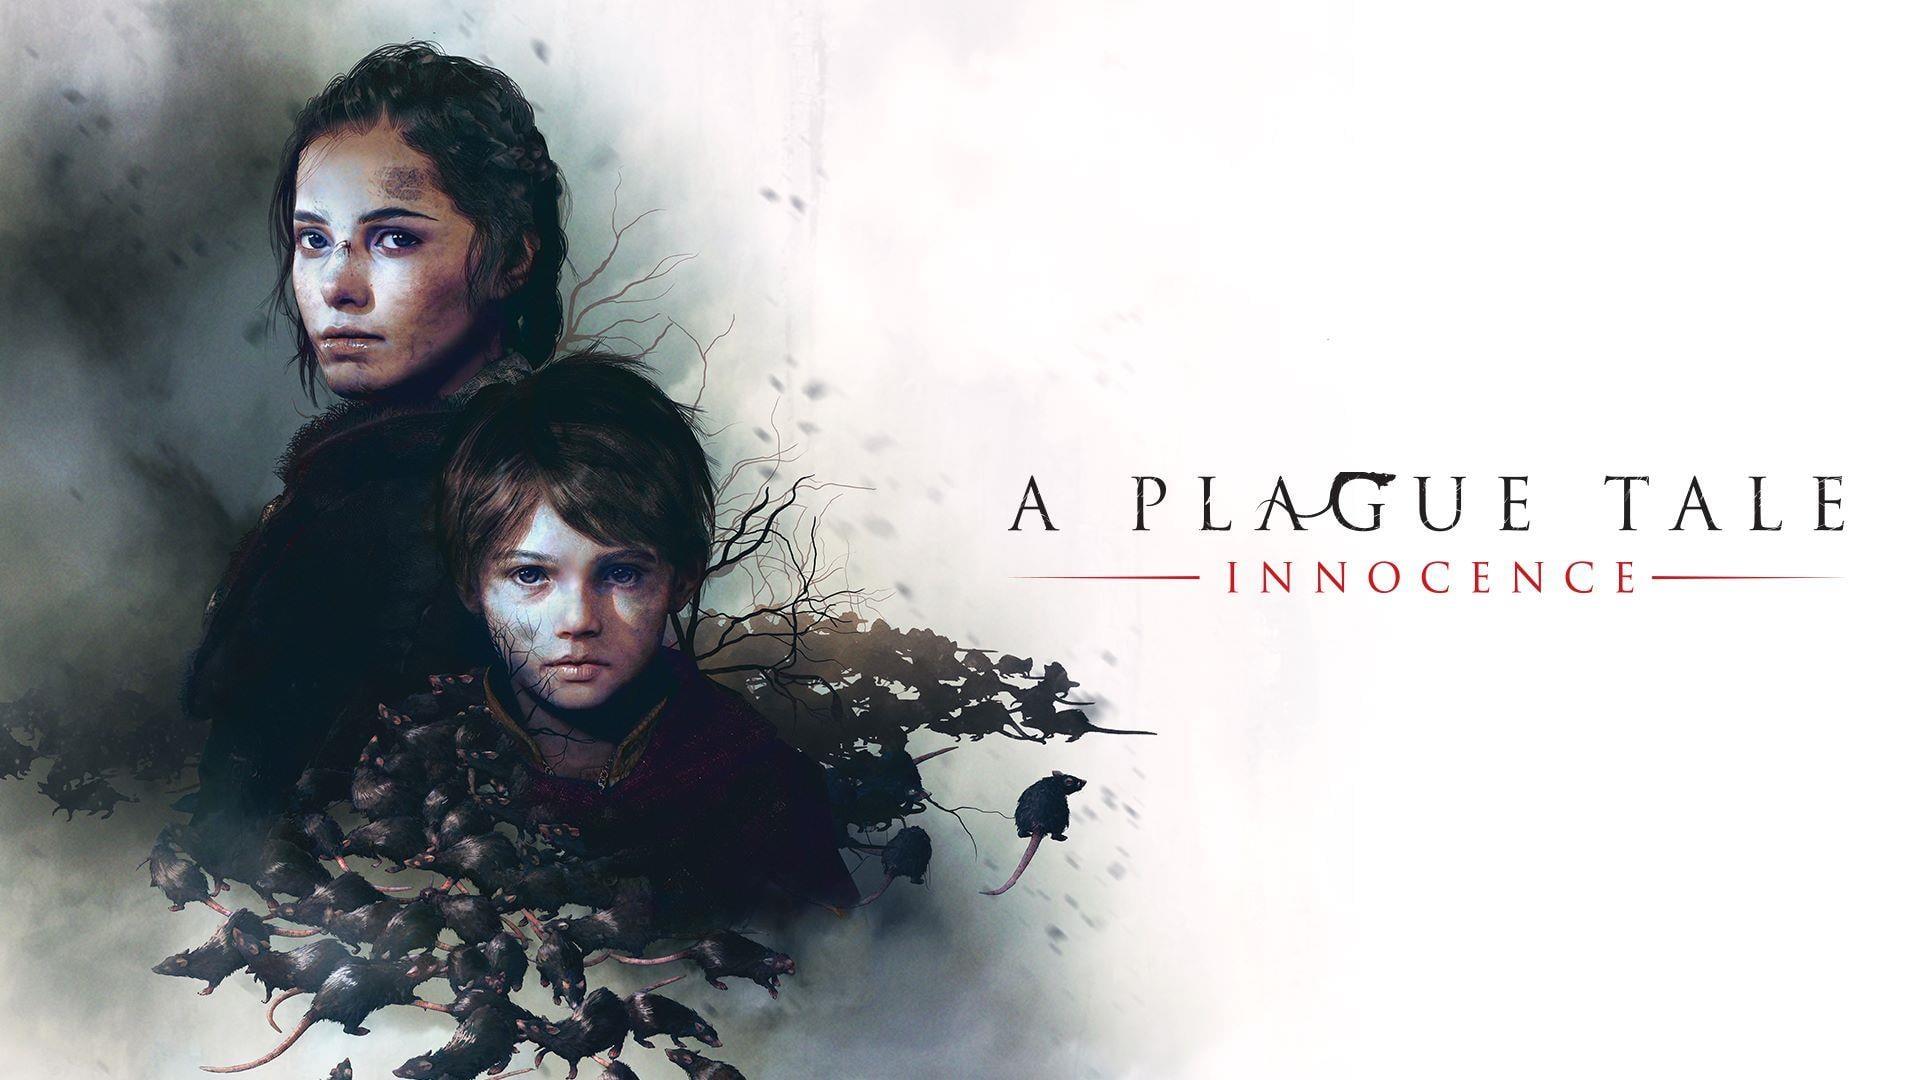 a plague tale innocence game wallpaper 67480